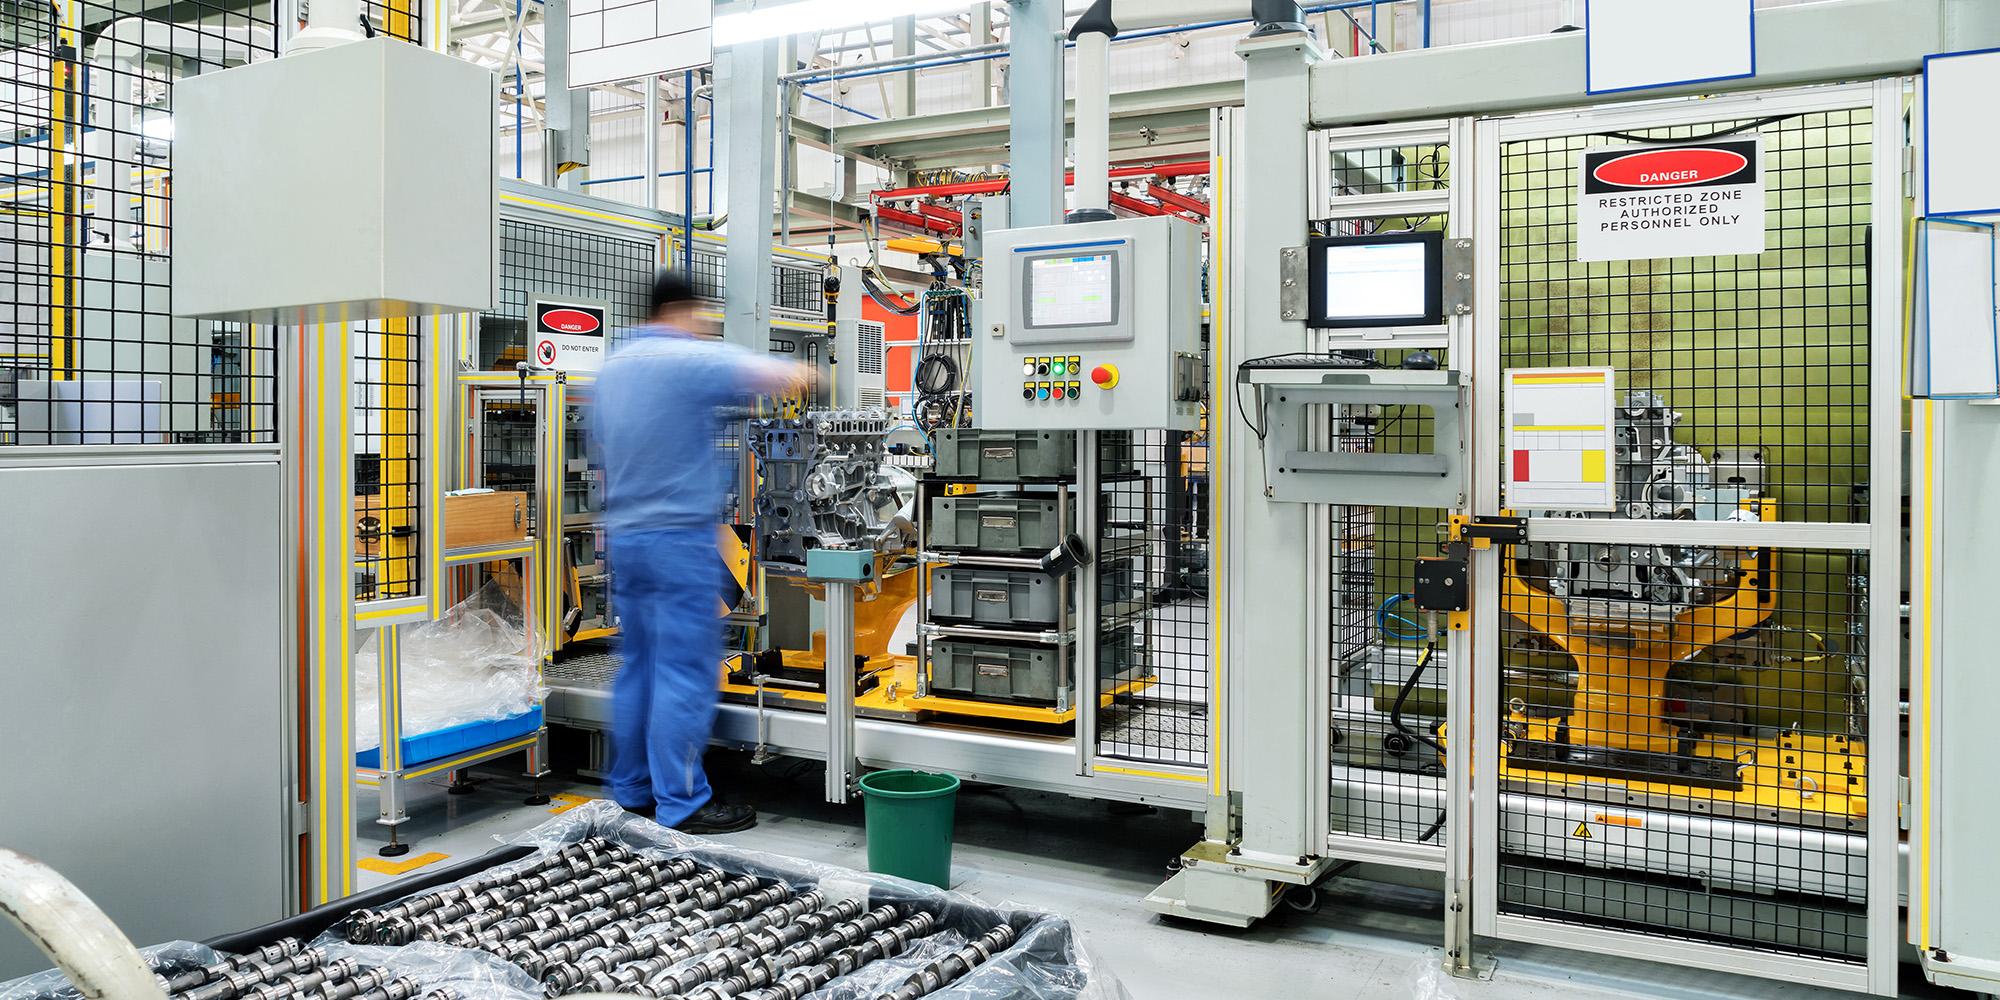 Worker in industrial setting